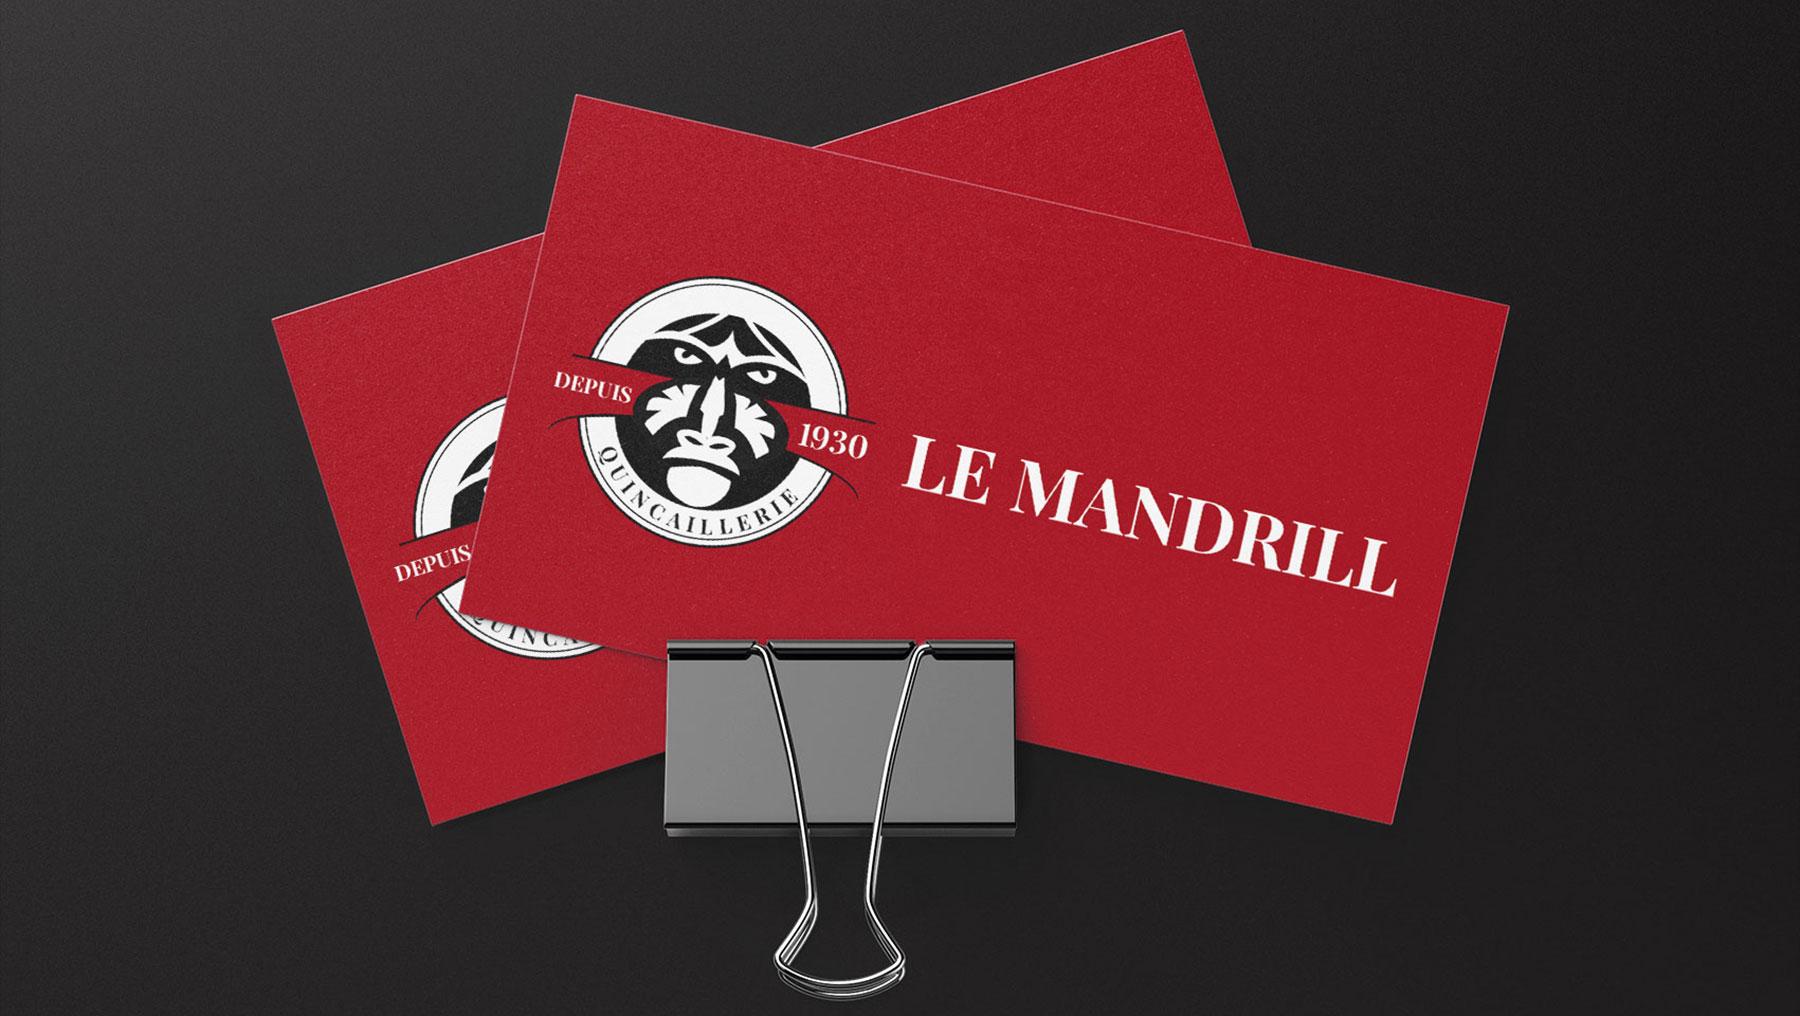 logo-lemandrill- Droguerie-Centaur-83-ruedeHausquette-64600-Anglet-quicaillerie